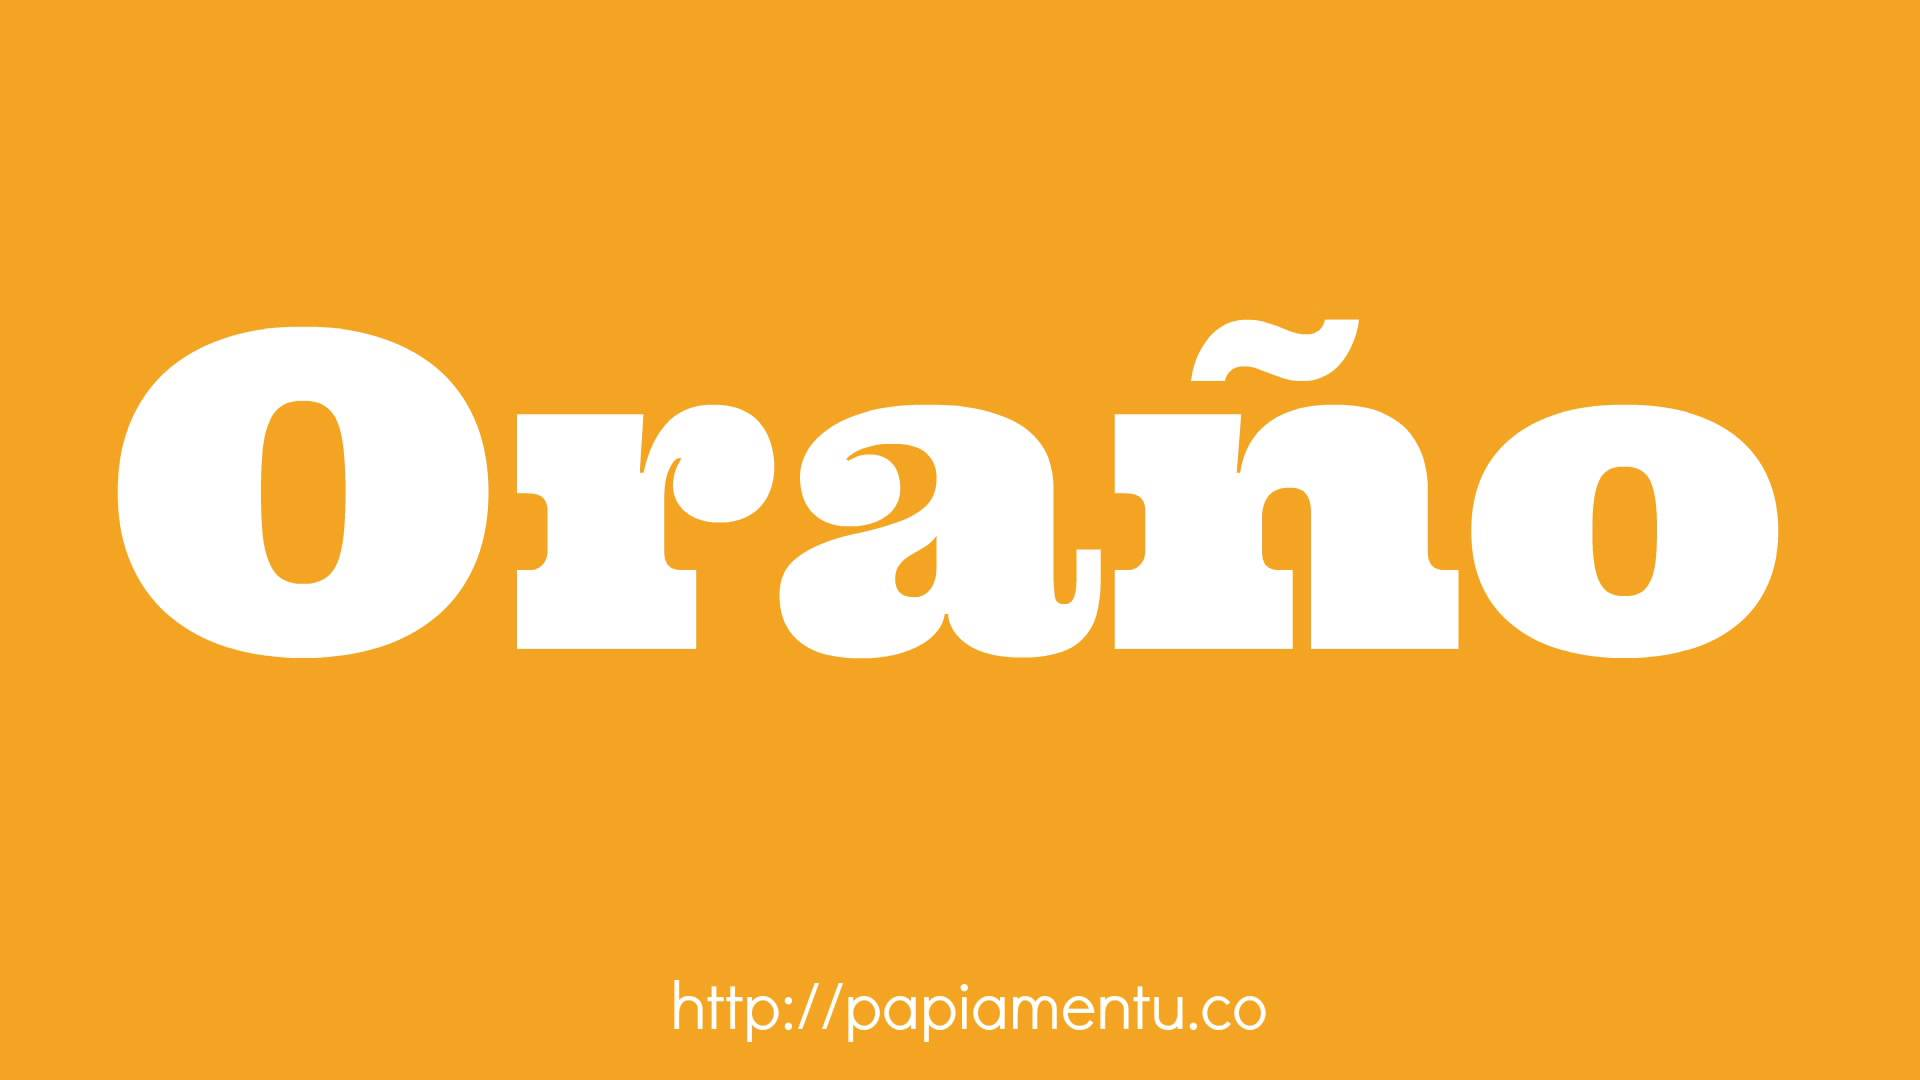 Zo zeg je Oranje in Papiamentu - Papiamentu.co